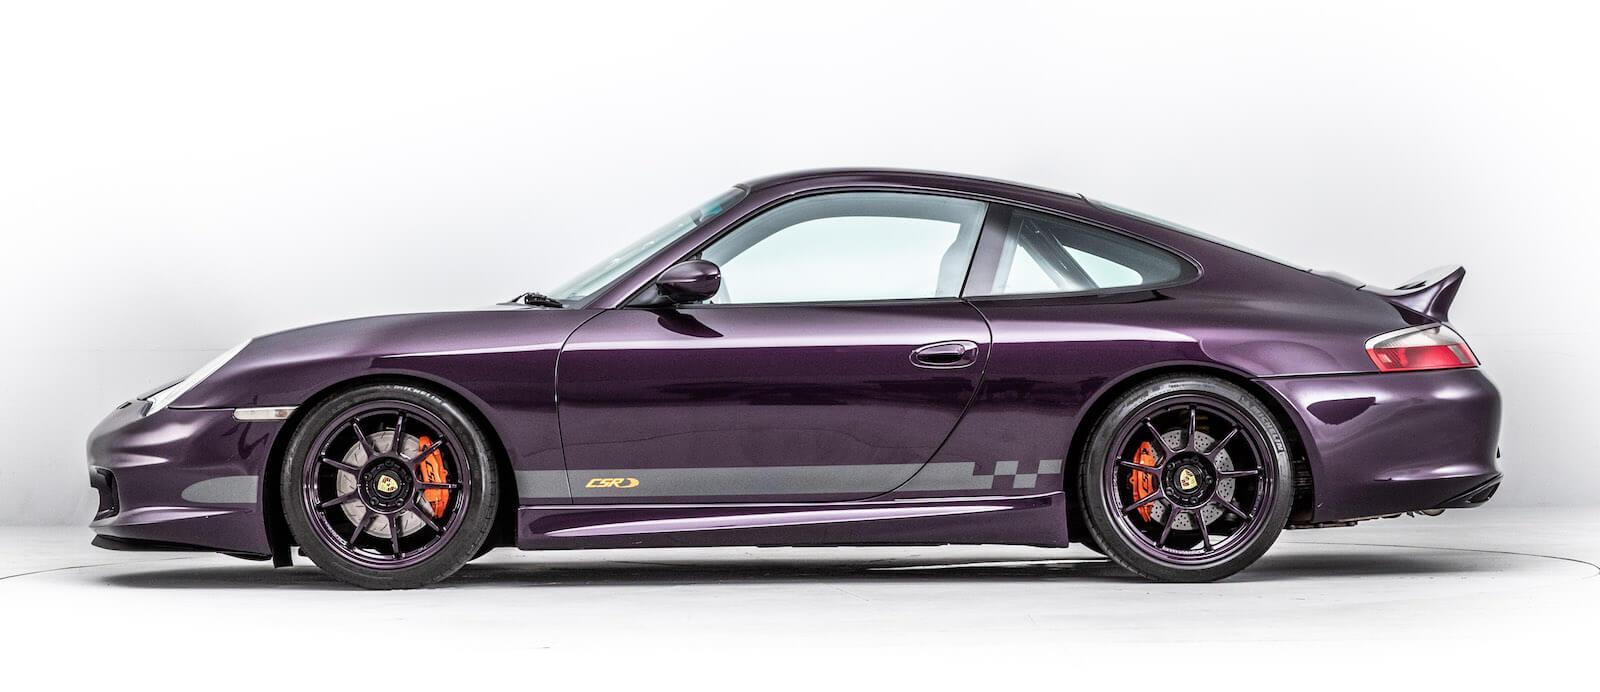 911uk com - Porsche Forum : View topic - Latest 996 CSR Evo